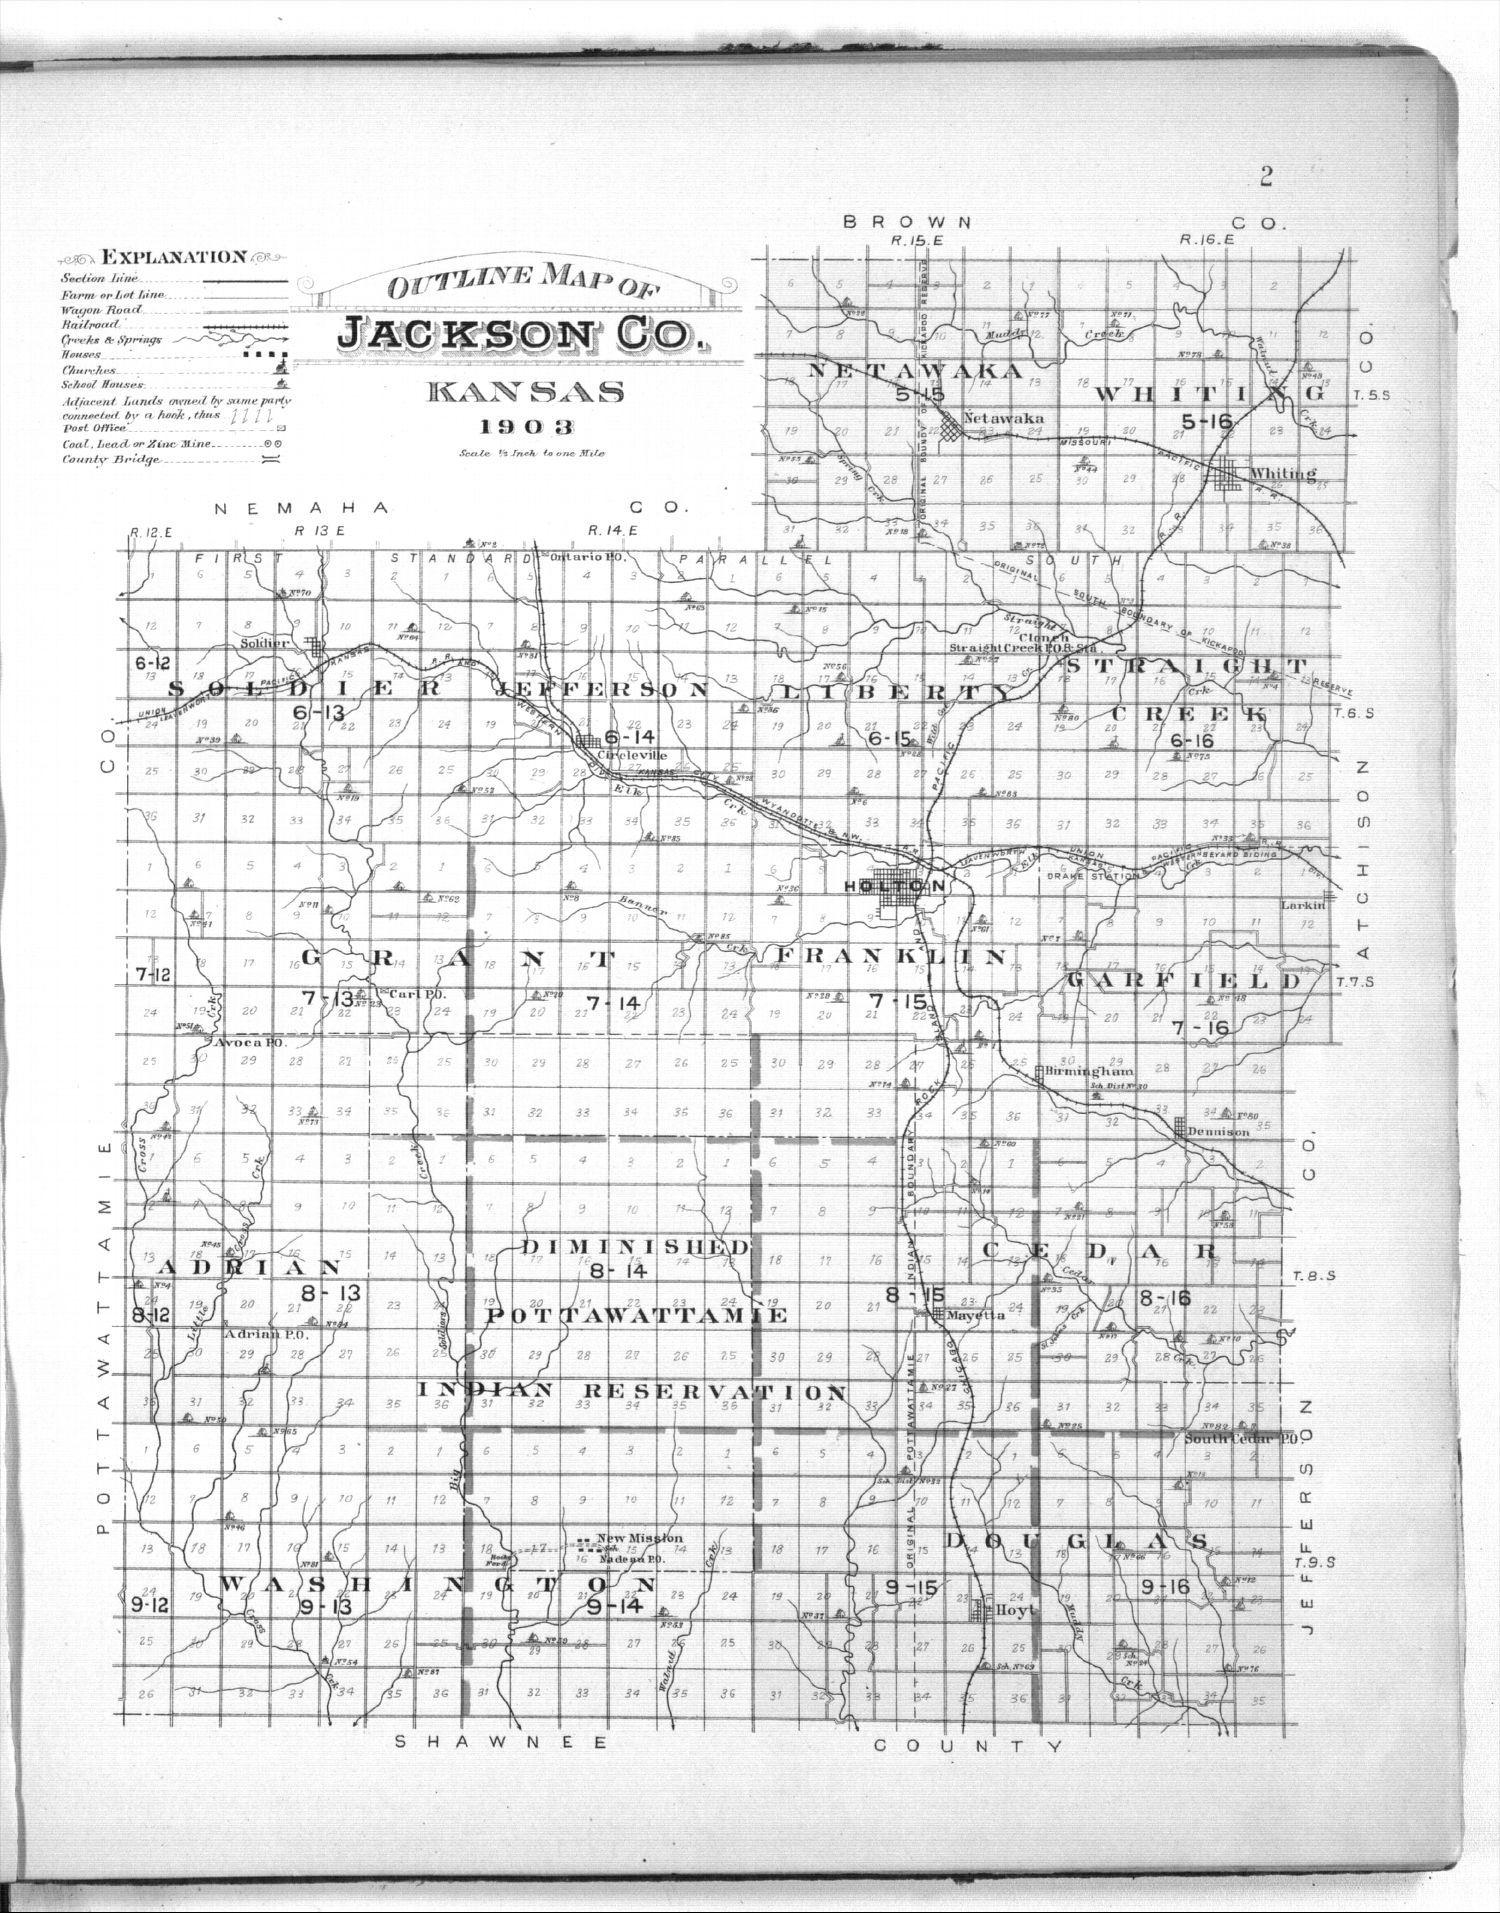 Plat book of Jackson County, Kansas - 2